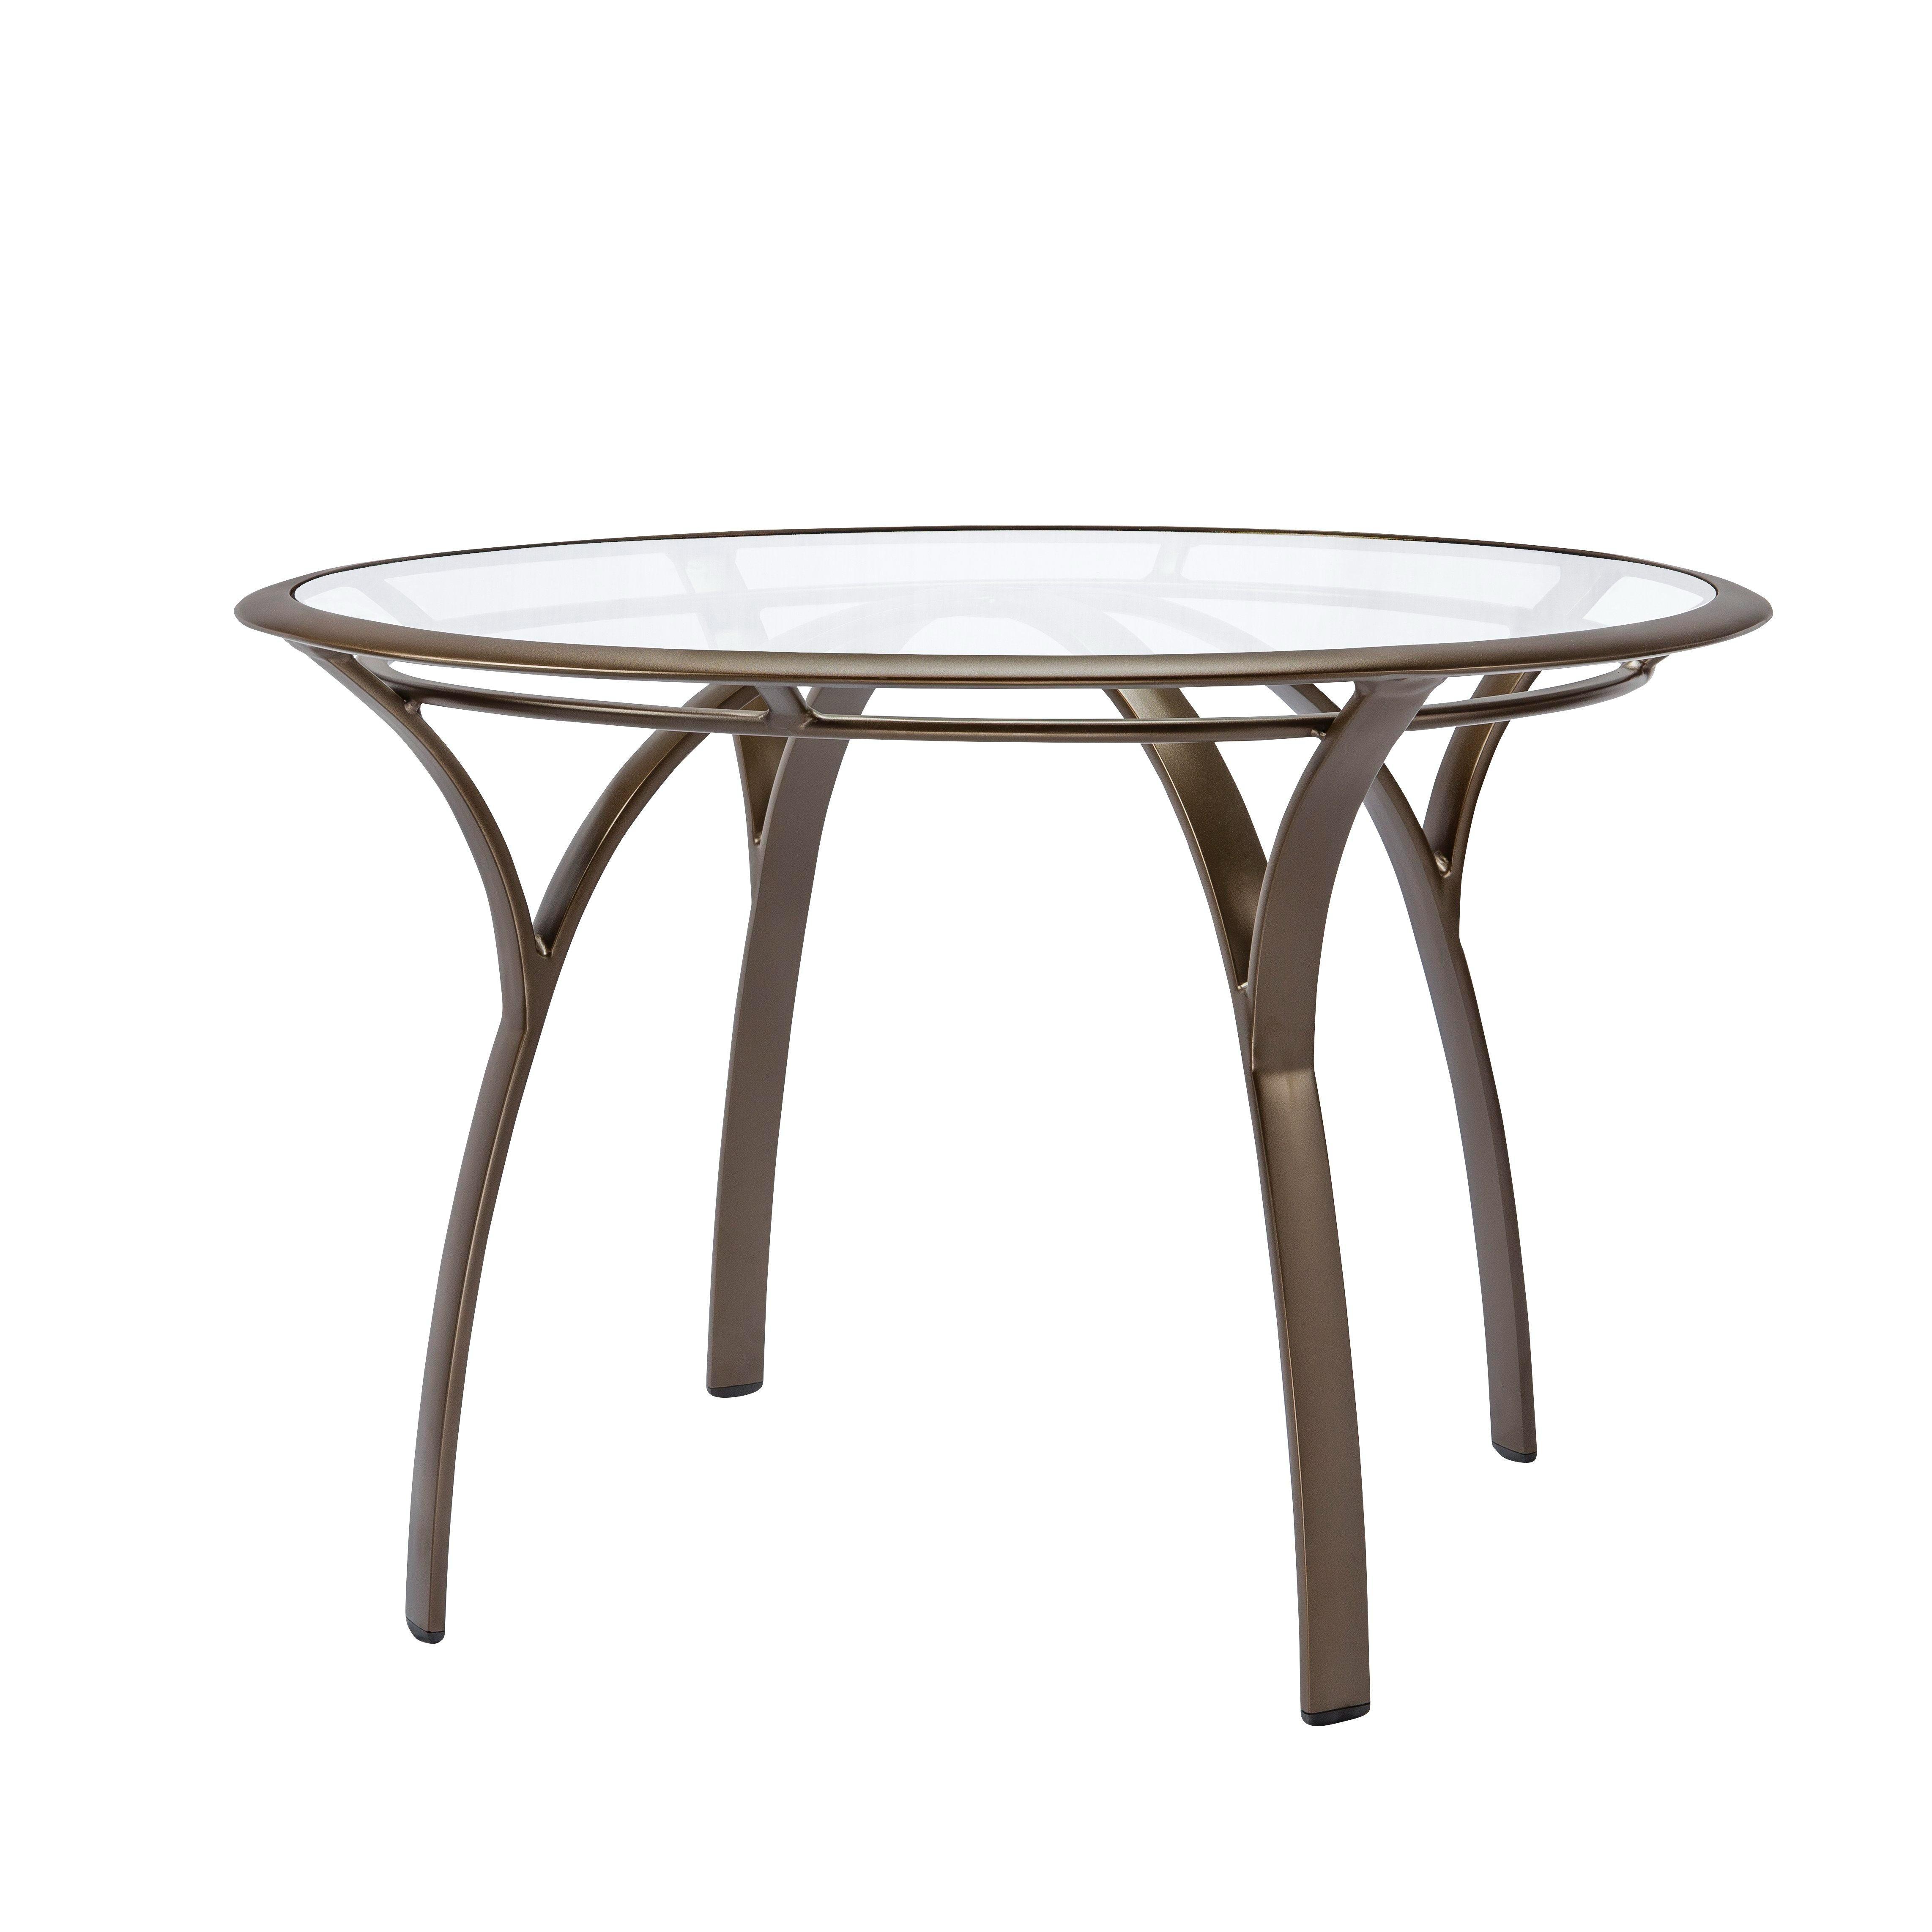 42 Inch Round Dining Table Brown Jordan 5191 4200